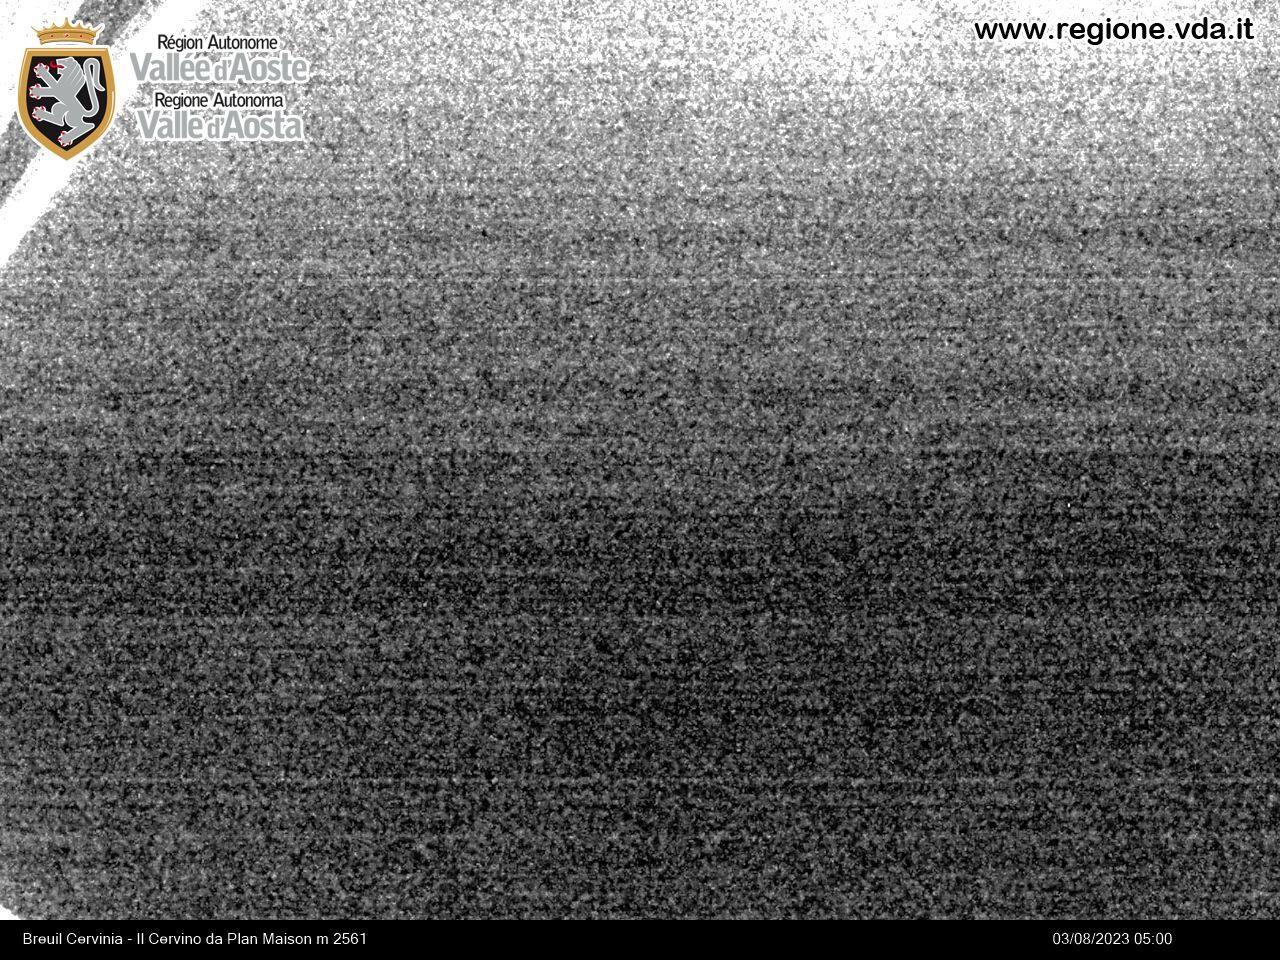 Valtournenche: Breuil